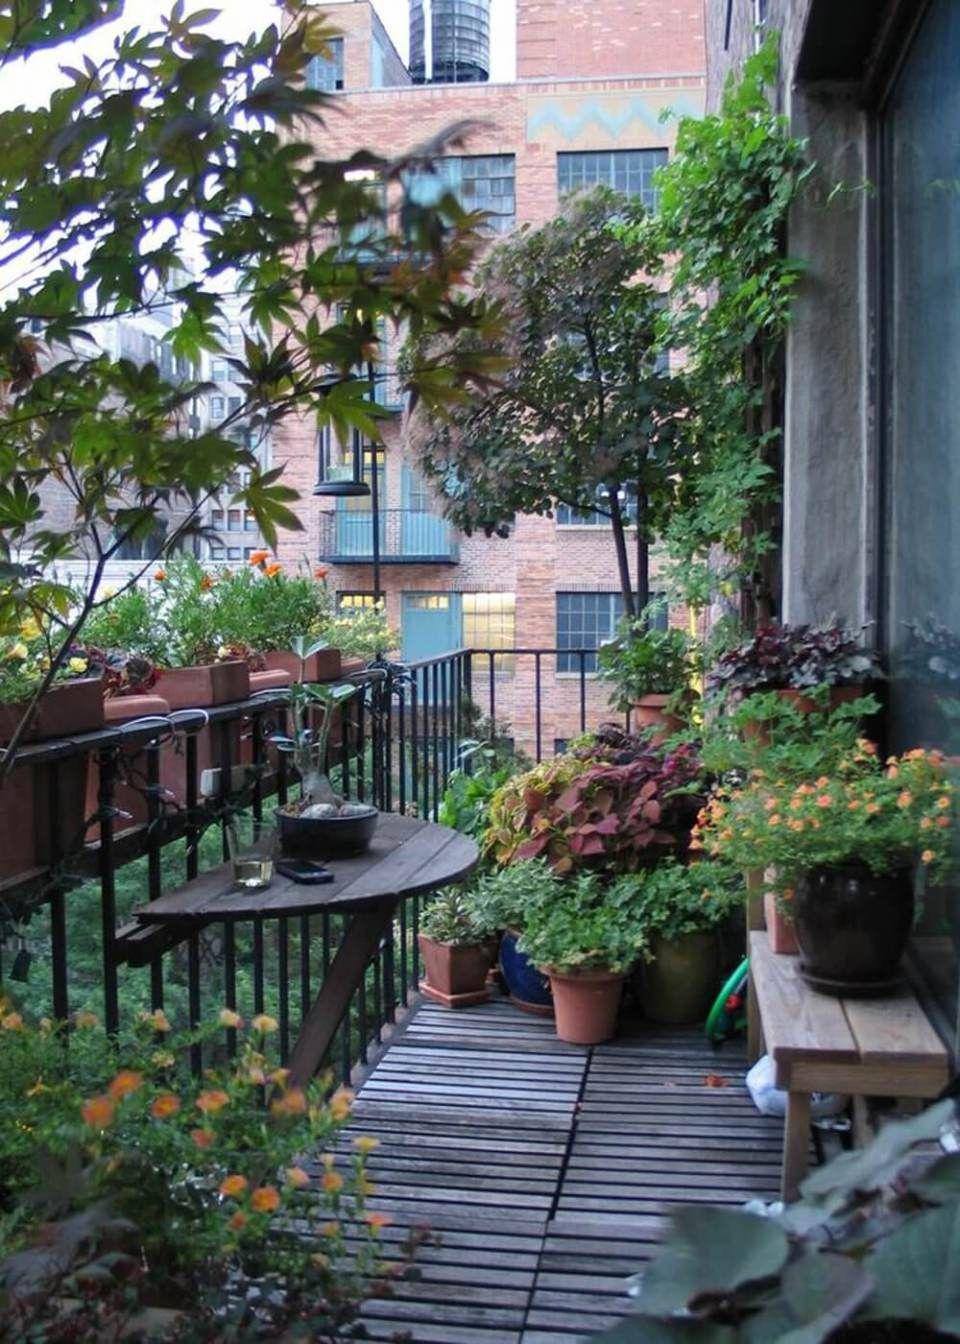 50 Amazing Balcony Garden Designs Ideas Farmfoodfamily Small Patio Garden Patio Garden Balcony Garden